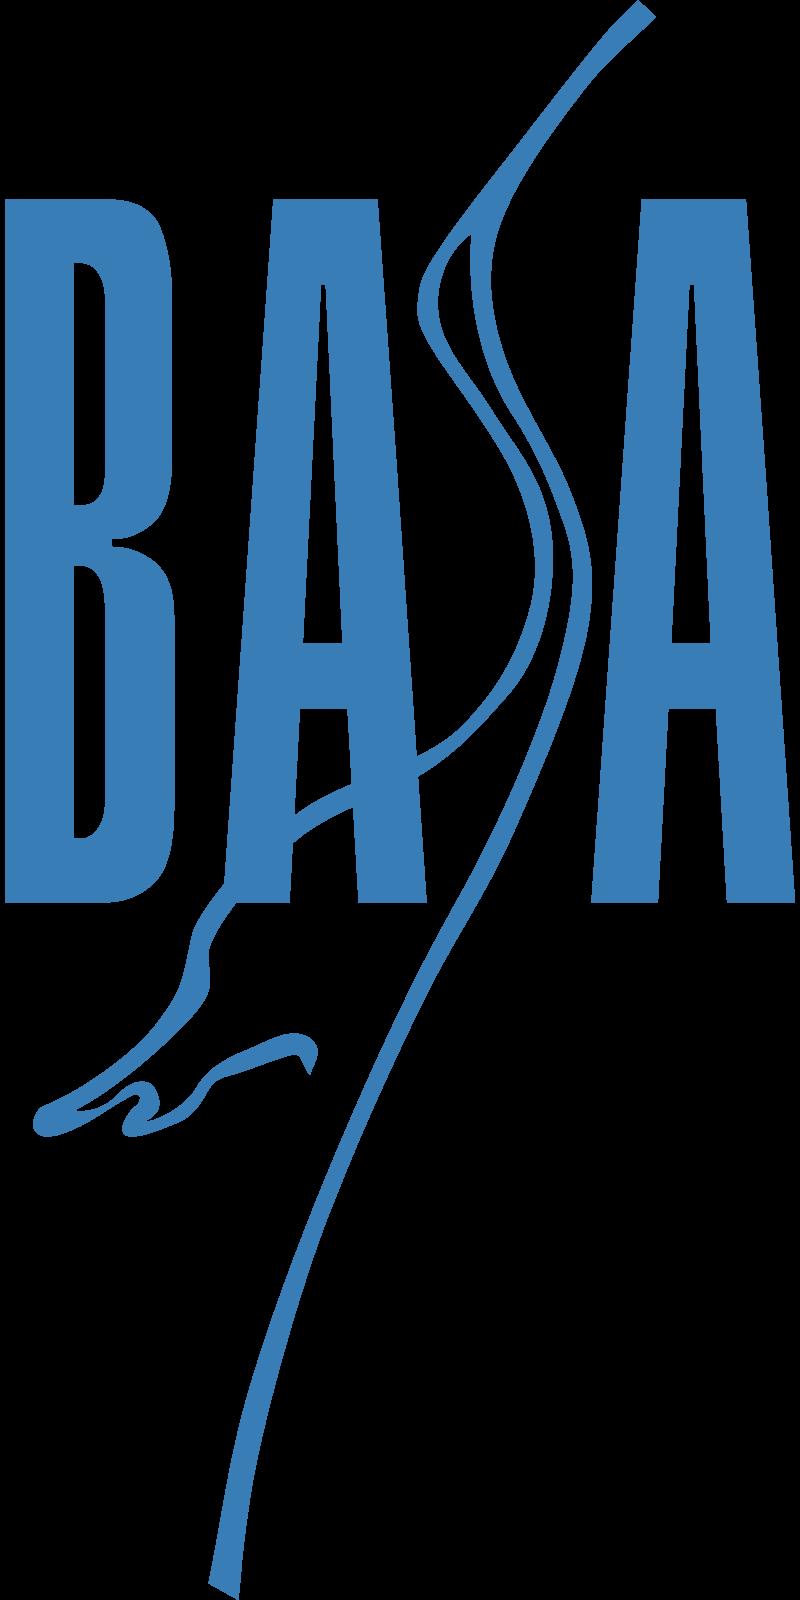 BASA PRESS2 vector